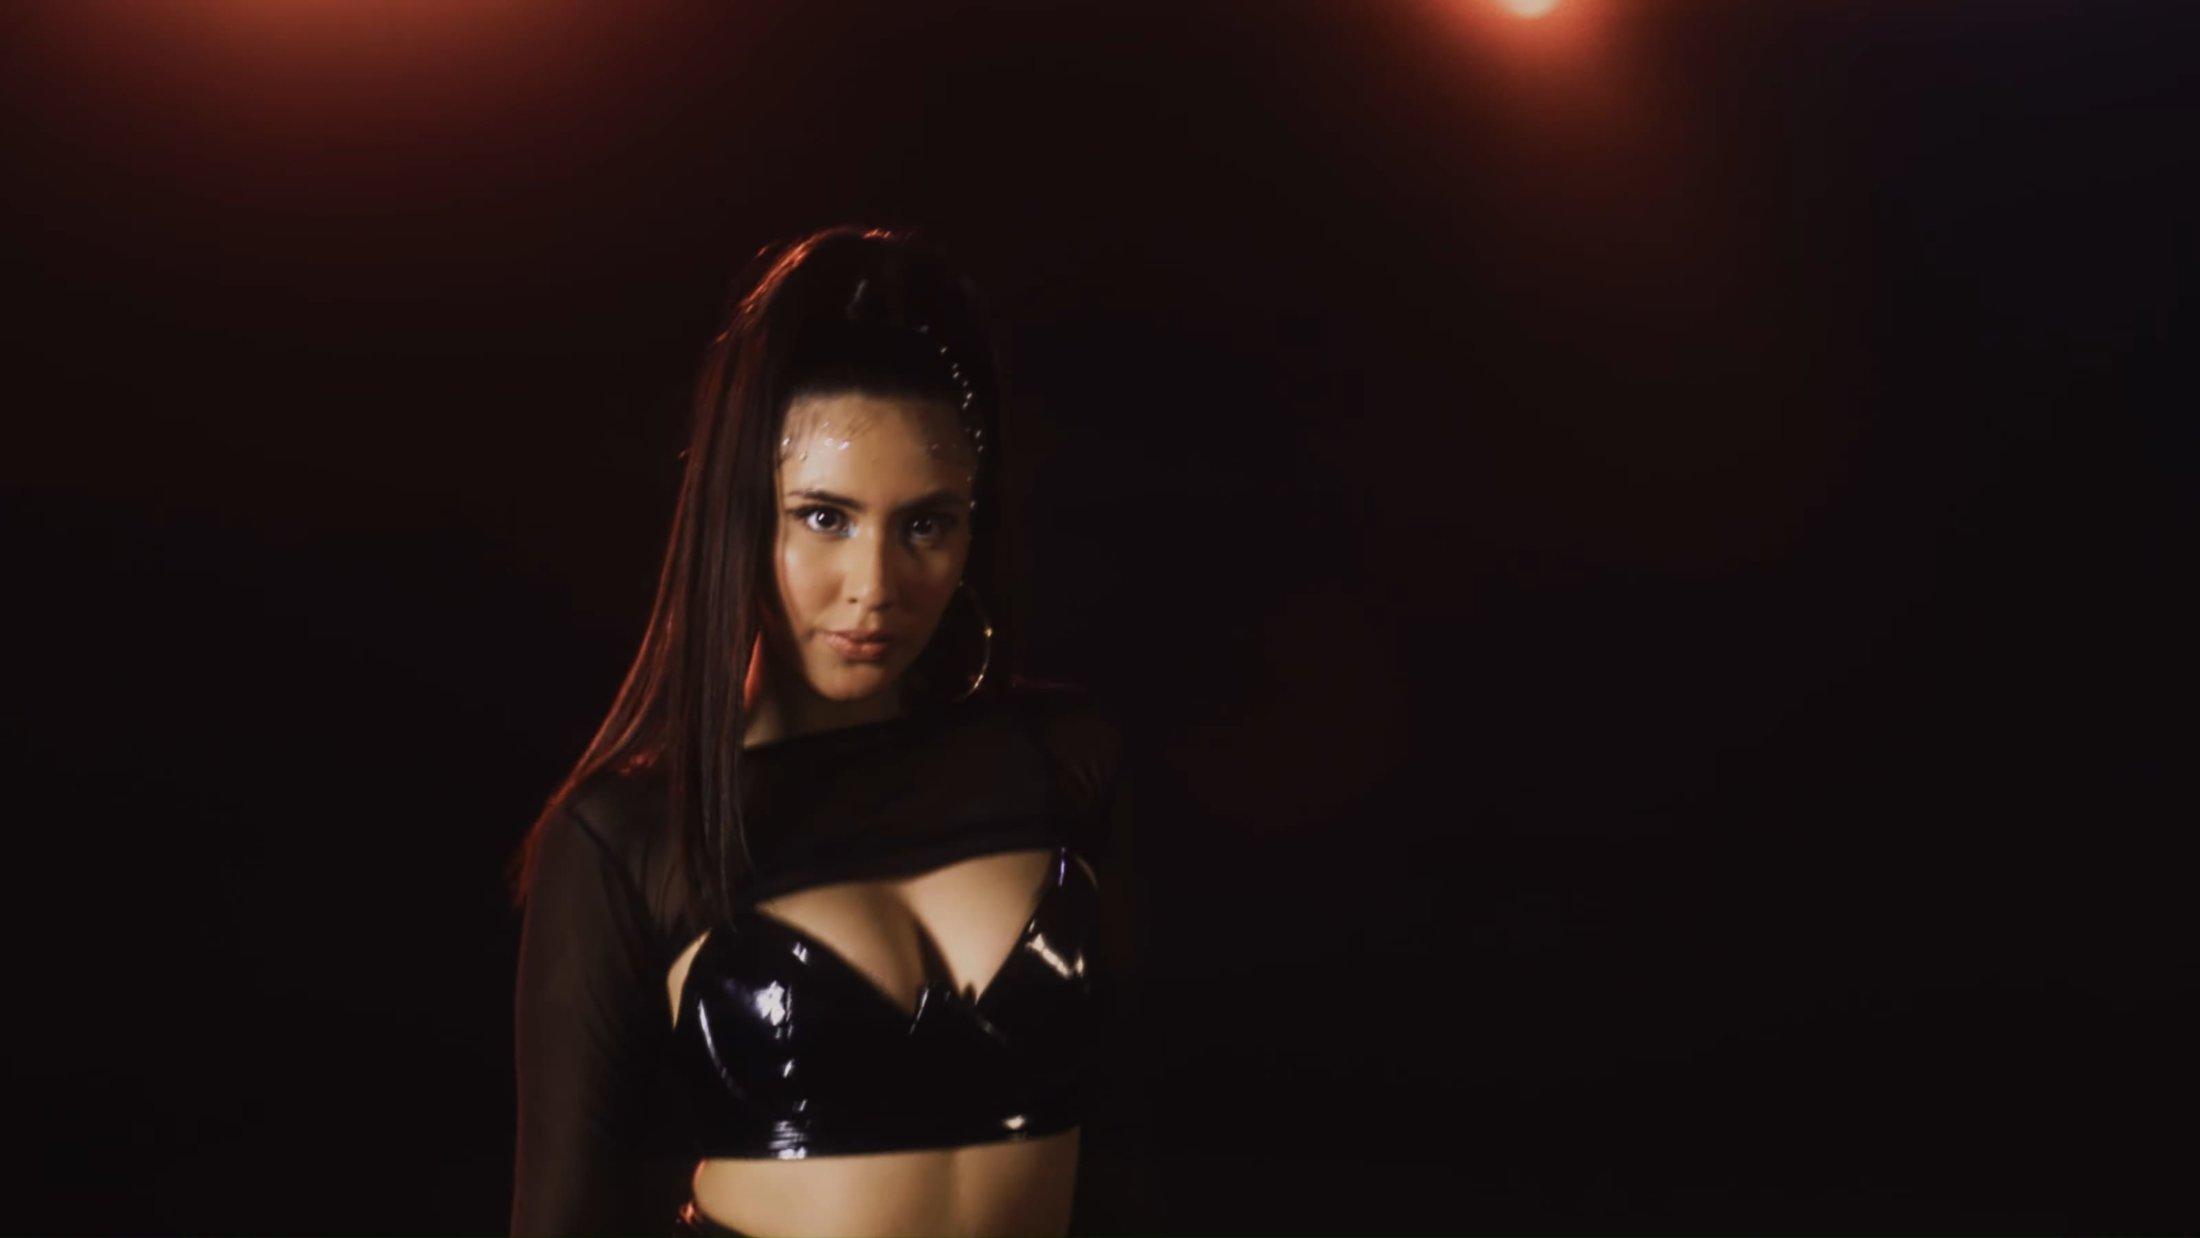 Cromantis - Red (Video Oficial) 2-54 Screenshot